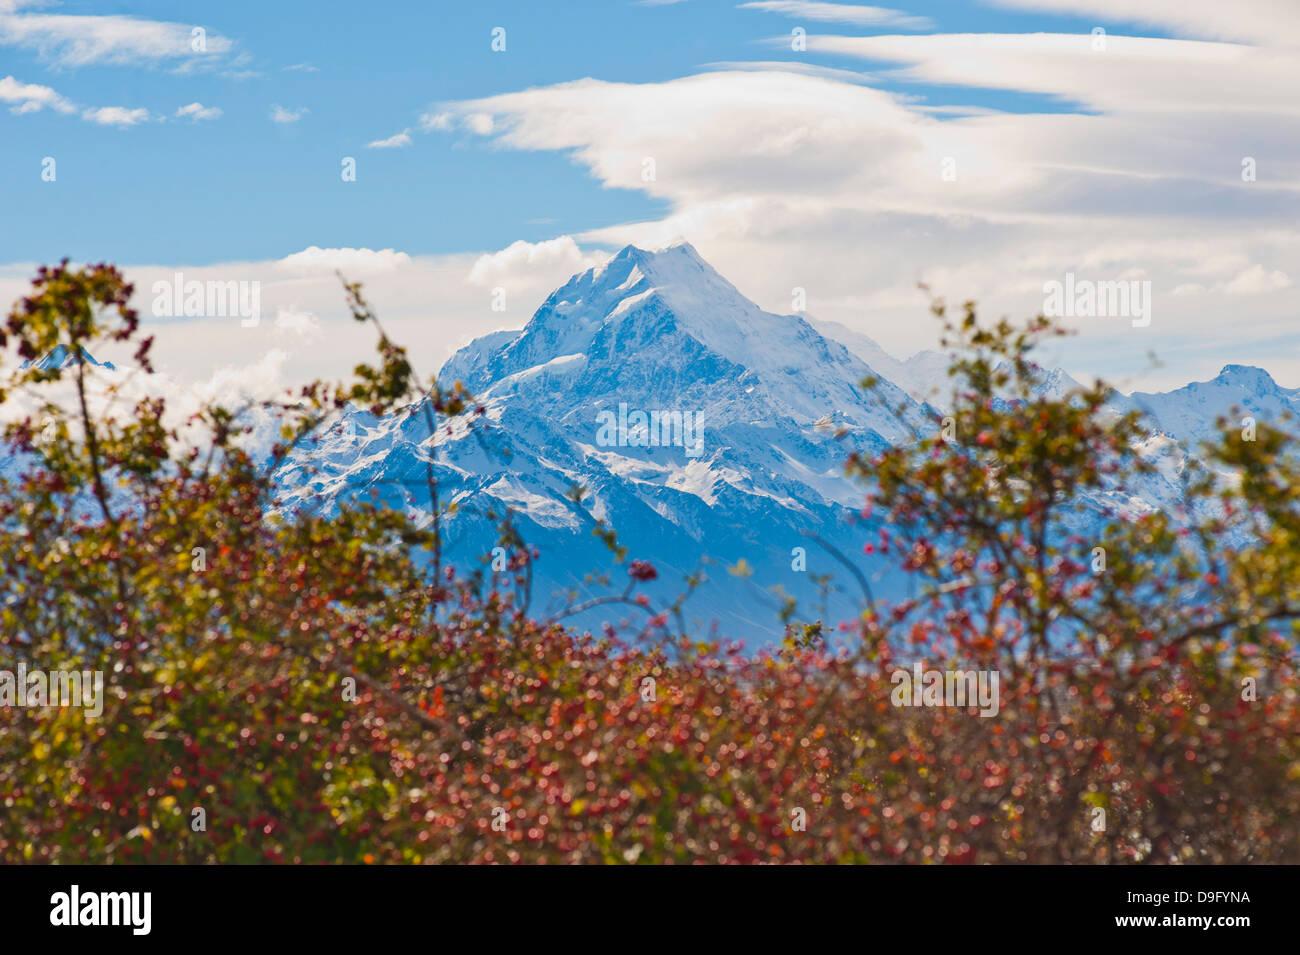 Mount Cook summit, Aoraki Mount Cook National Park, UNESCO World Heritage Site, South Island, New Zealand - Stock Image